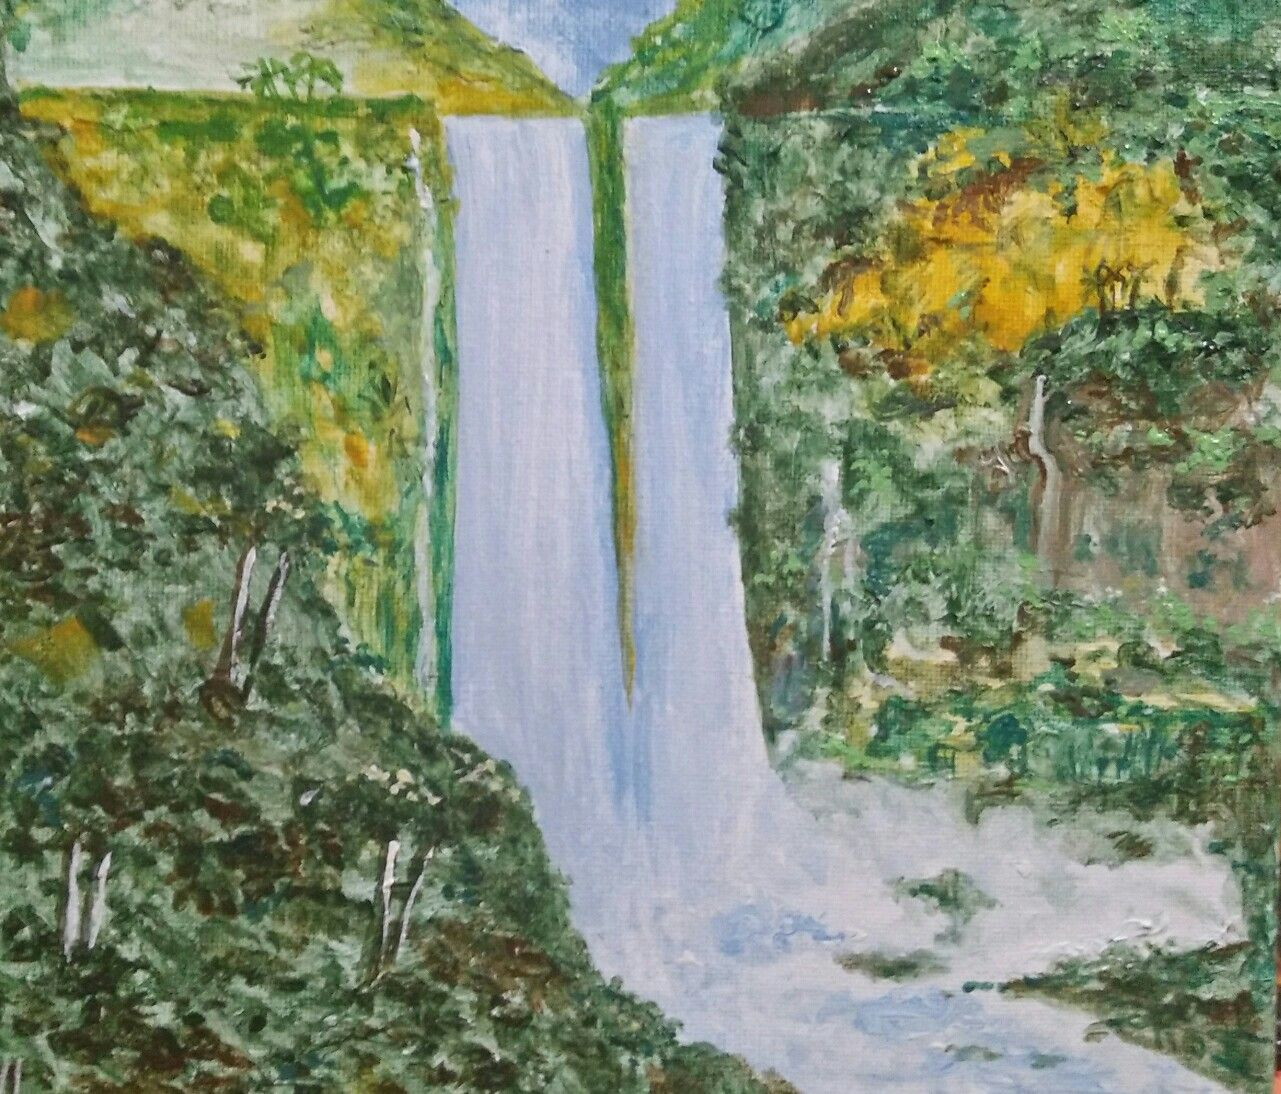 Pin By Pamela E Williams On Landscapes In 2020 Art Sketchbook